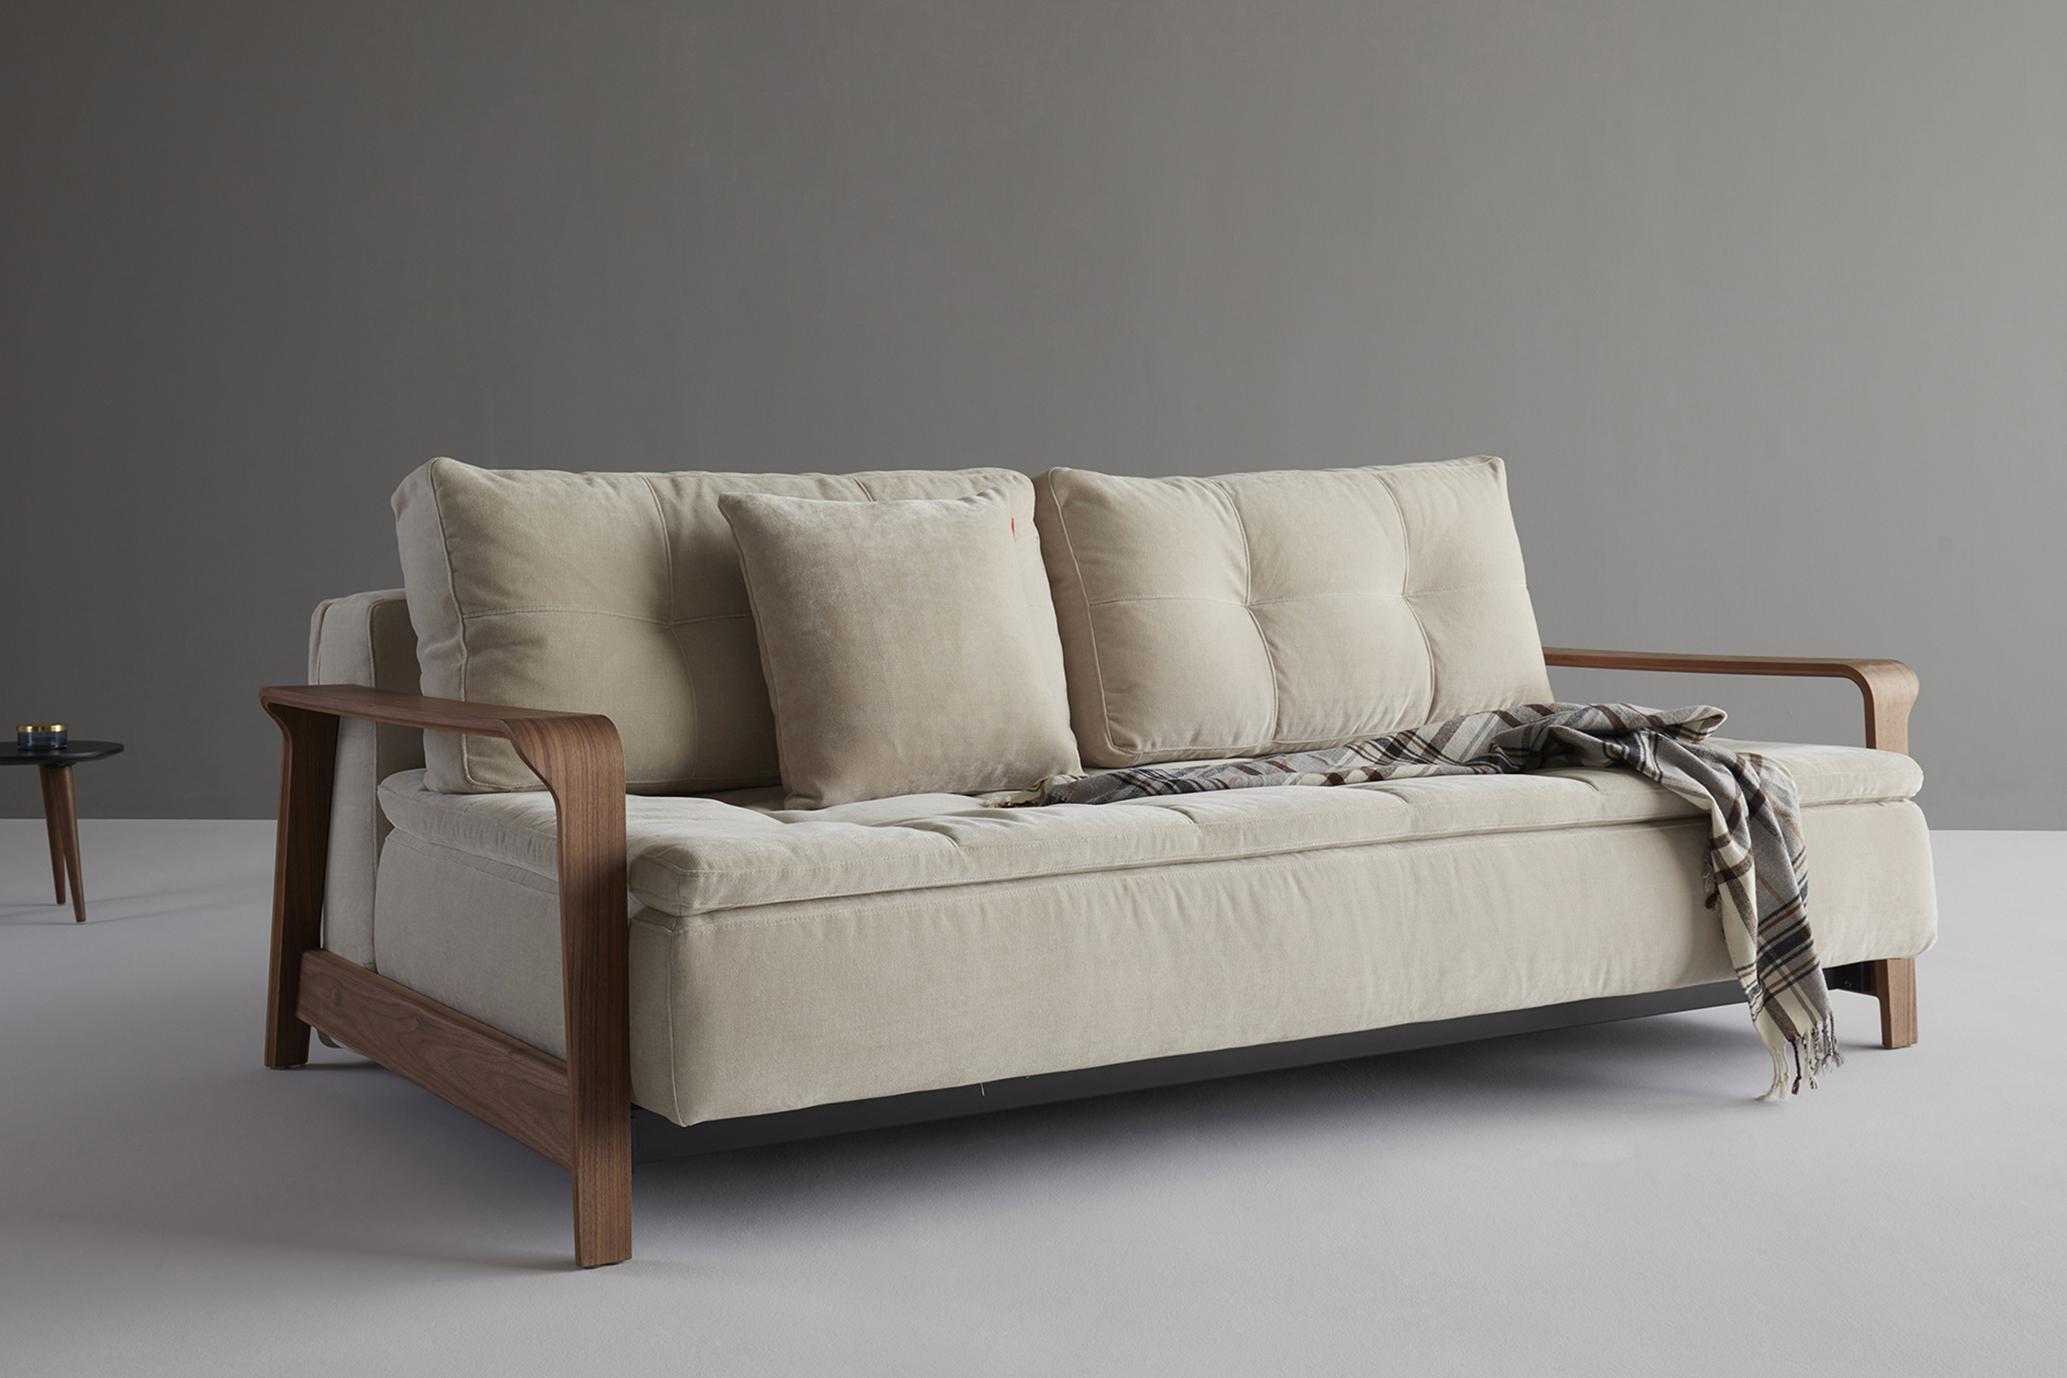 Ran-sofa-oliver-lukas-weisskrogh-2.jpg